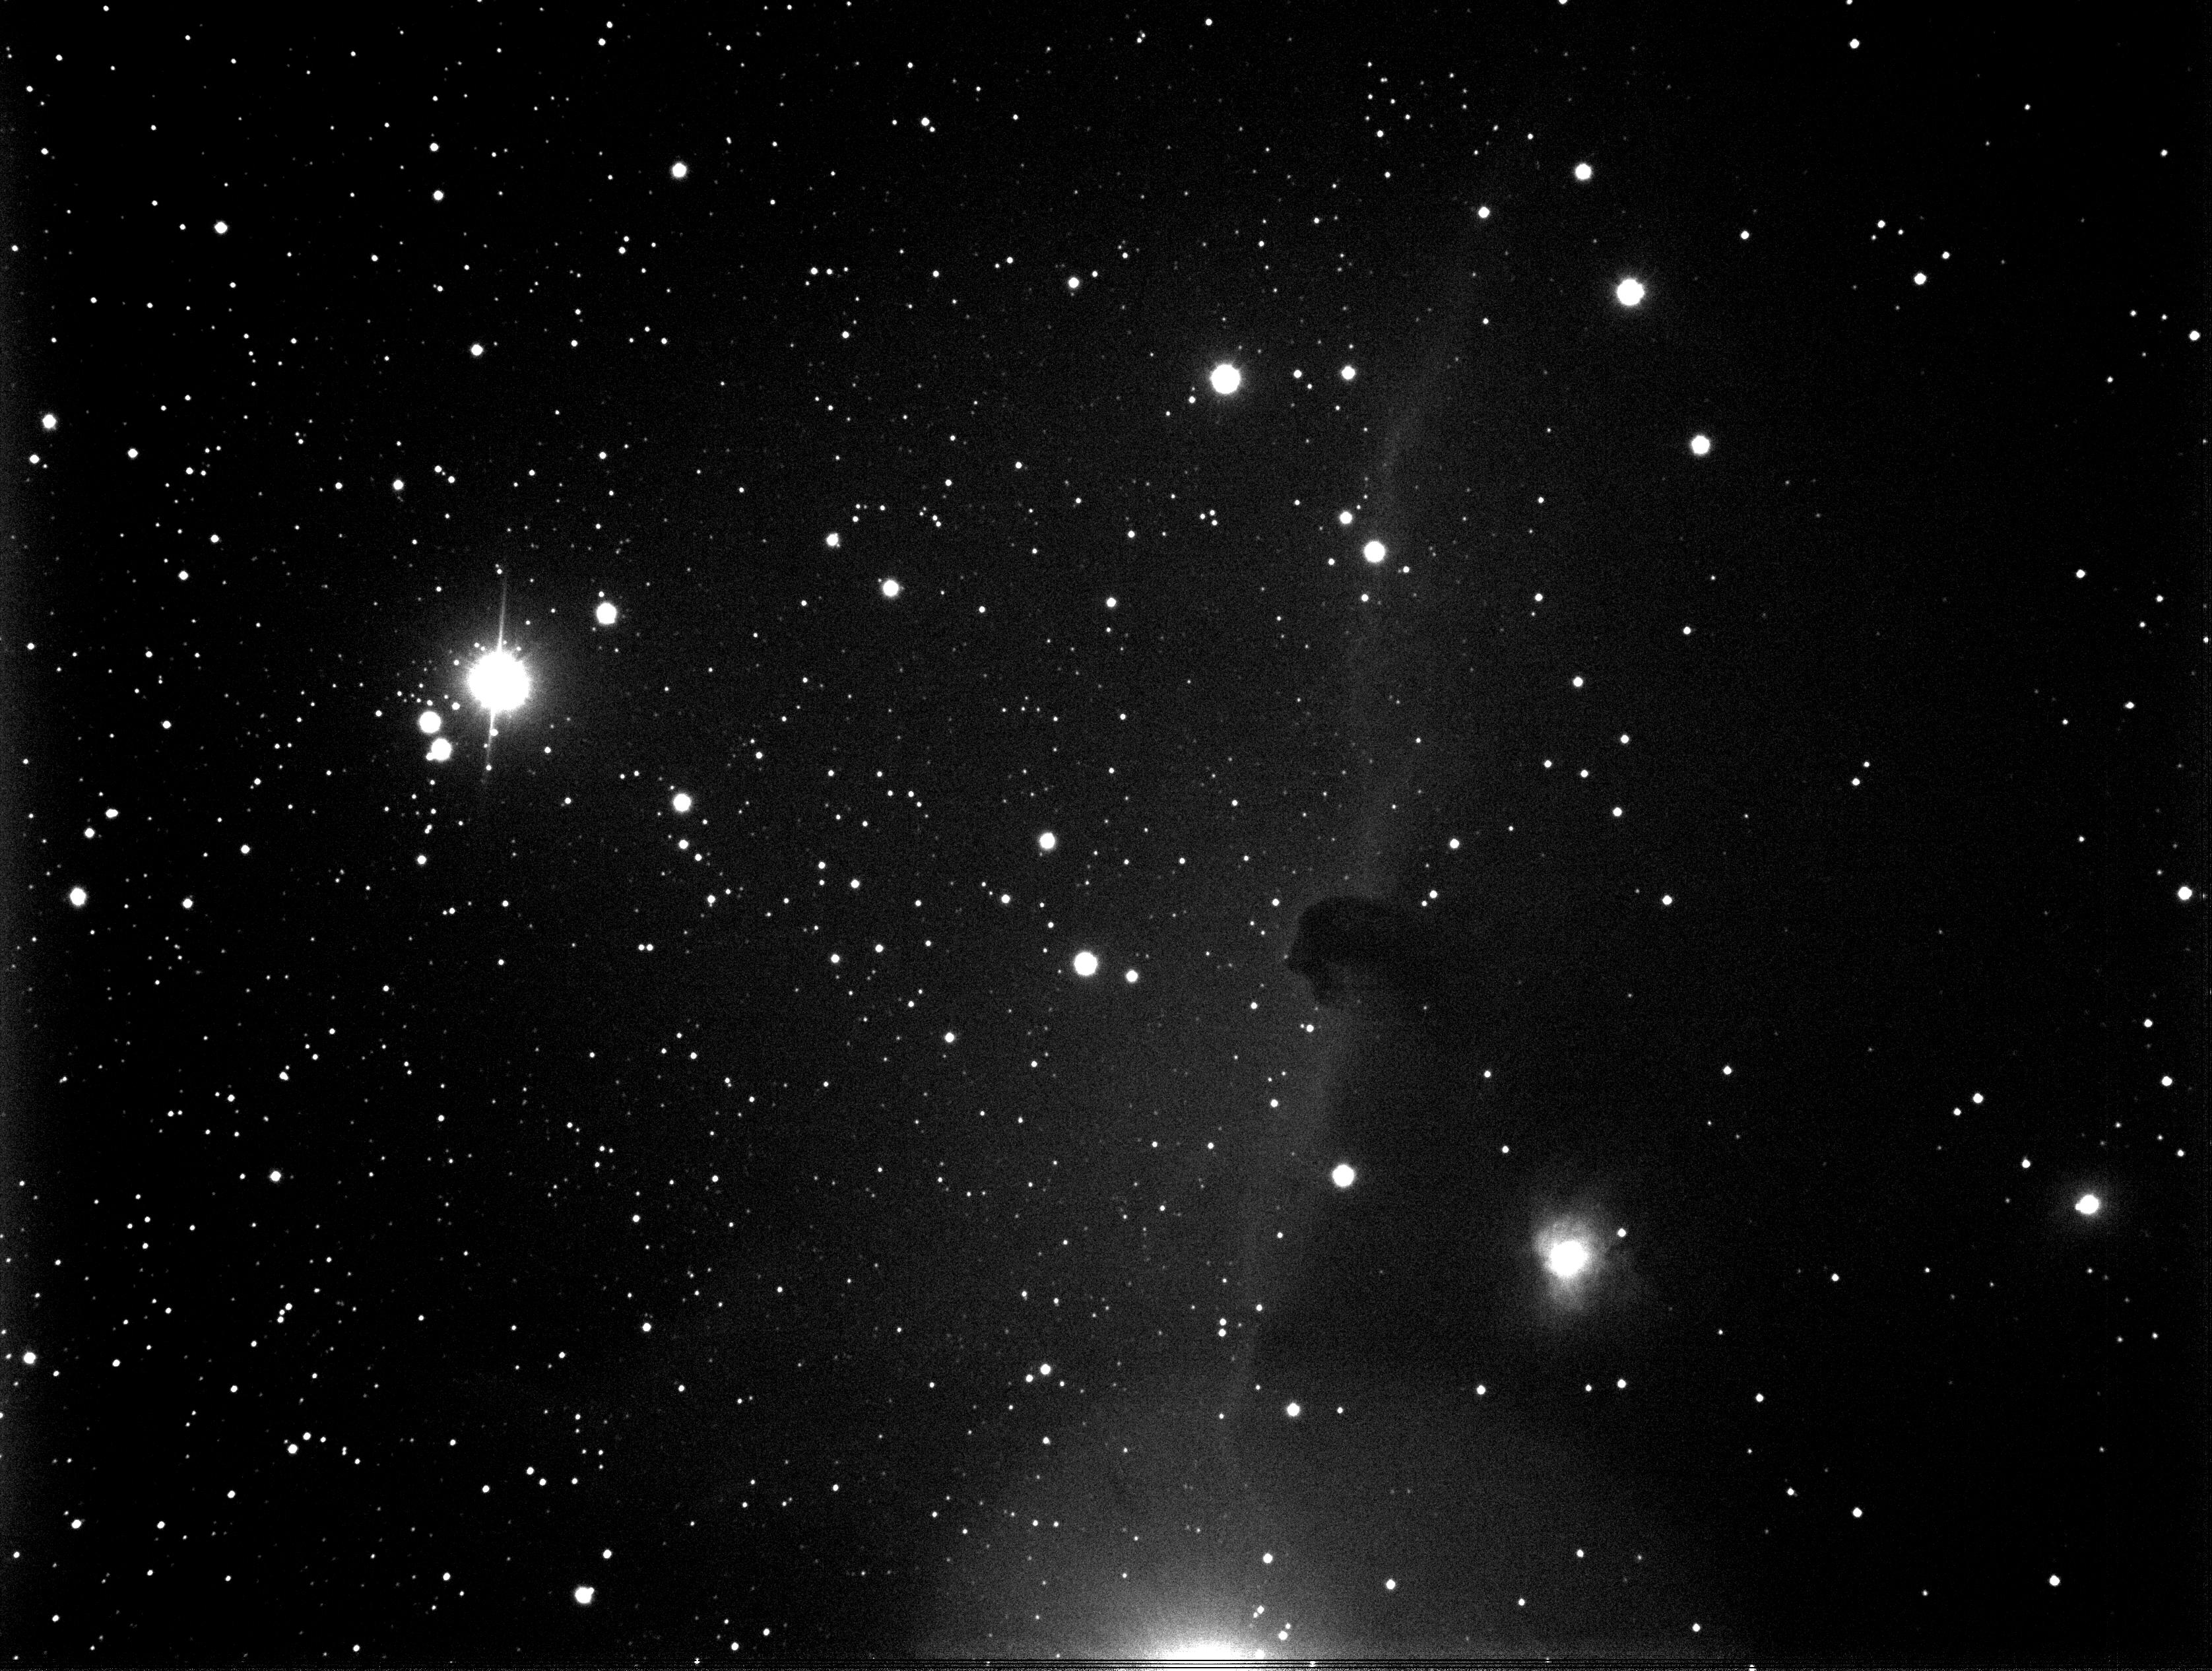 Hästhuvudnebulosan B33 i Orion mot IC434 i rött ljus. 10x20 sekunder. bin 2x2. 102mm f/7 refraktor. 27.12.2016. SBIG ST-8300 CCD. Foto: Jörgen Danielsson, Nybro.